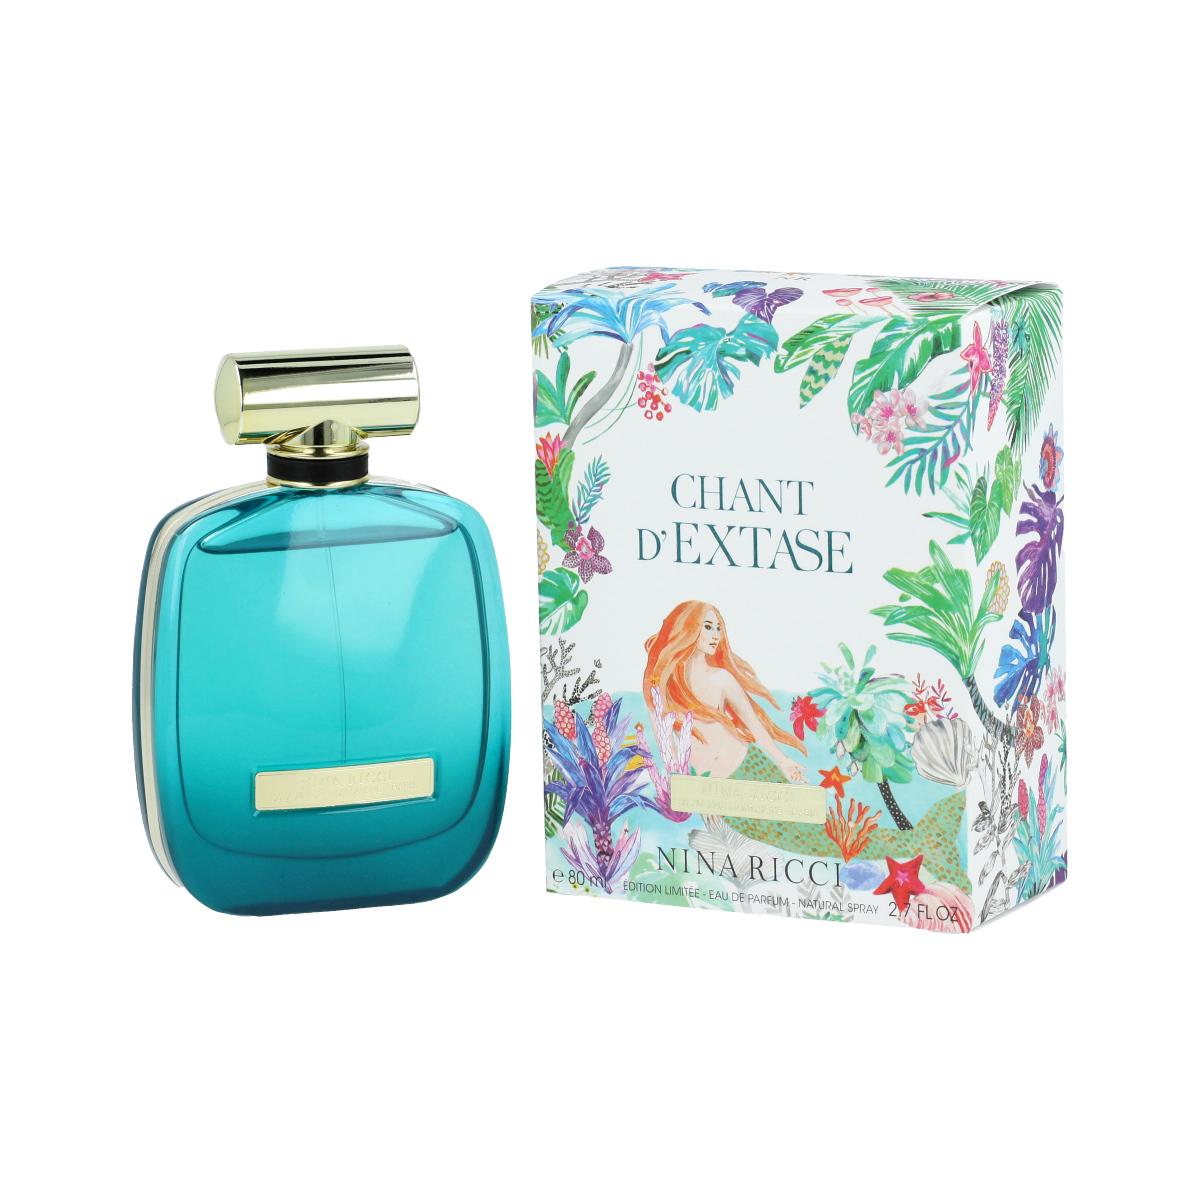 Nina Ricci Chant d'Extase Eau De Parfum 80 ml (woman) 16643